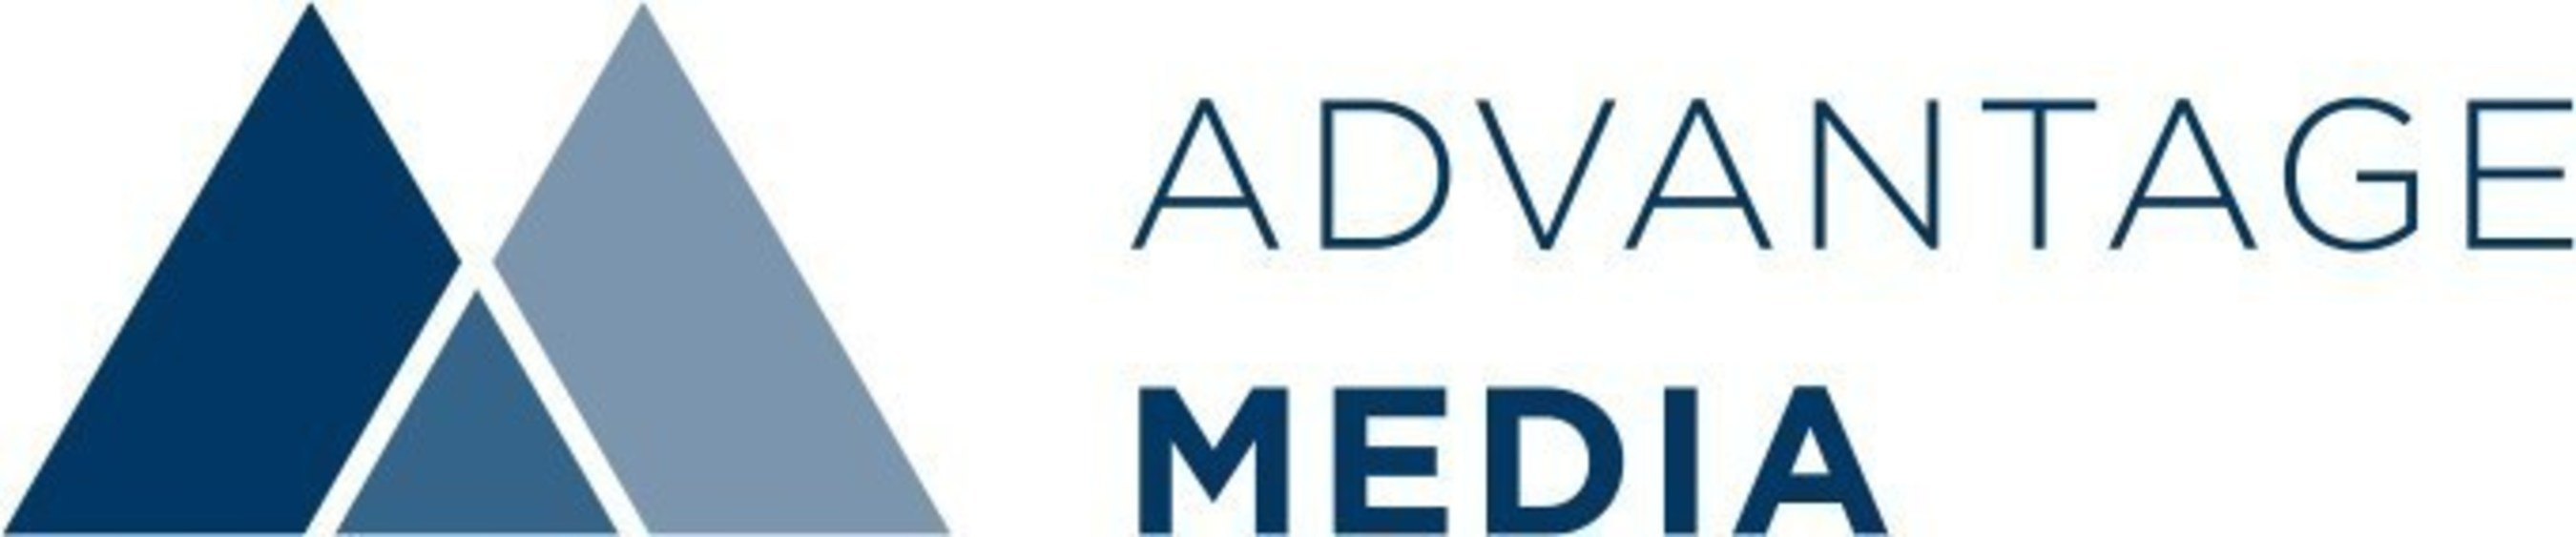 Advantage Media Launches; Transforming Shopper Marketing with Proprietary, MomentAware Technology